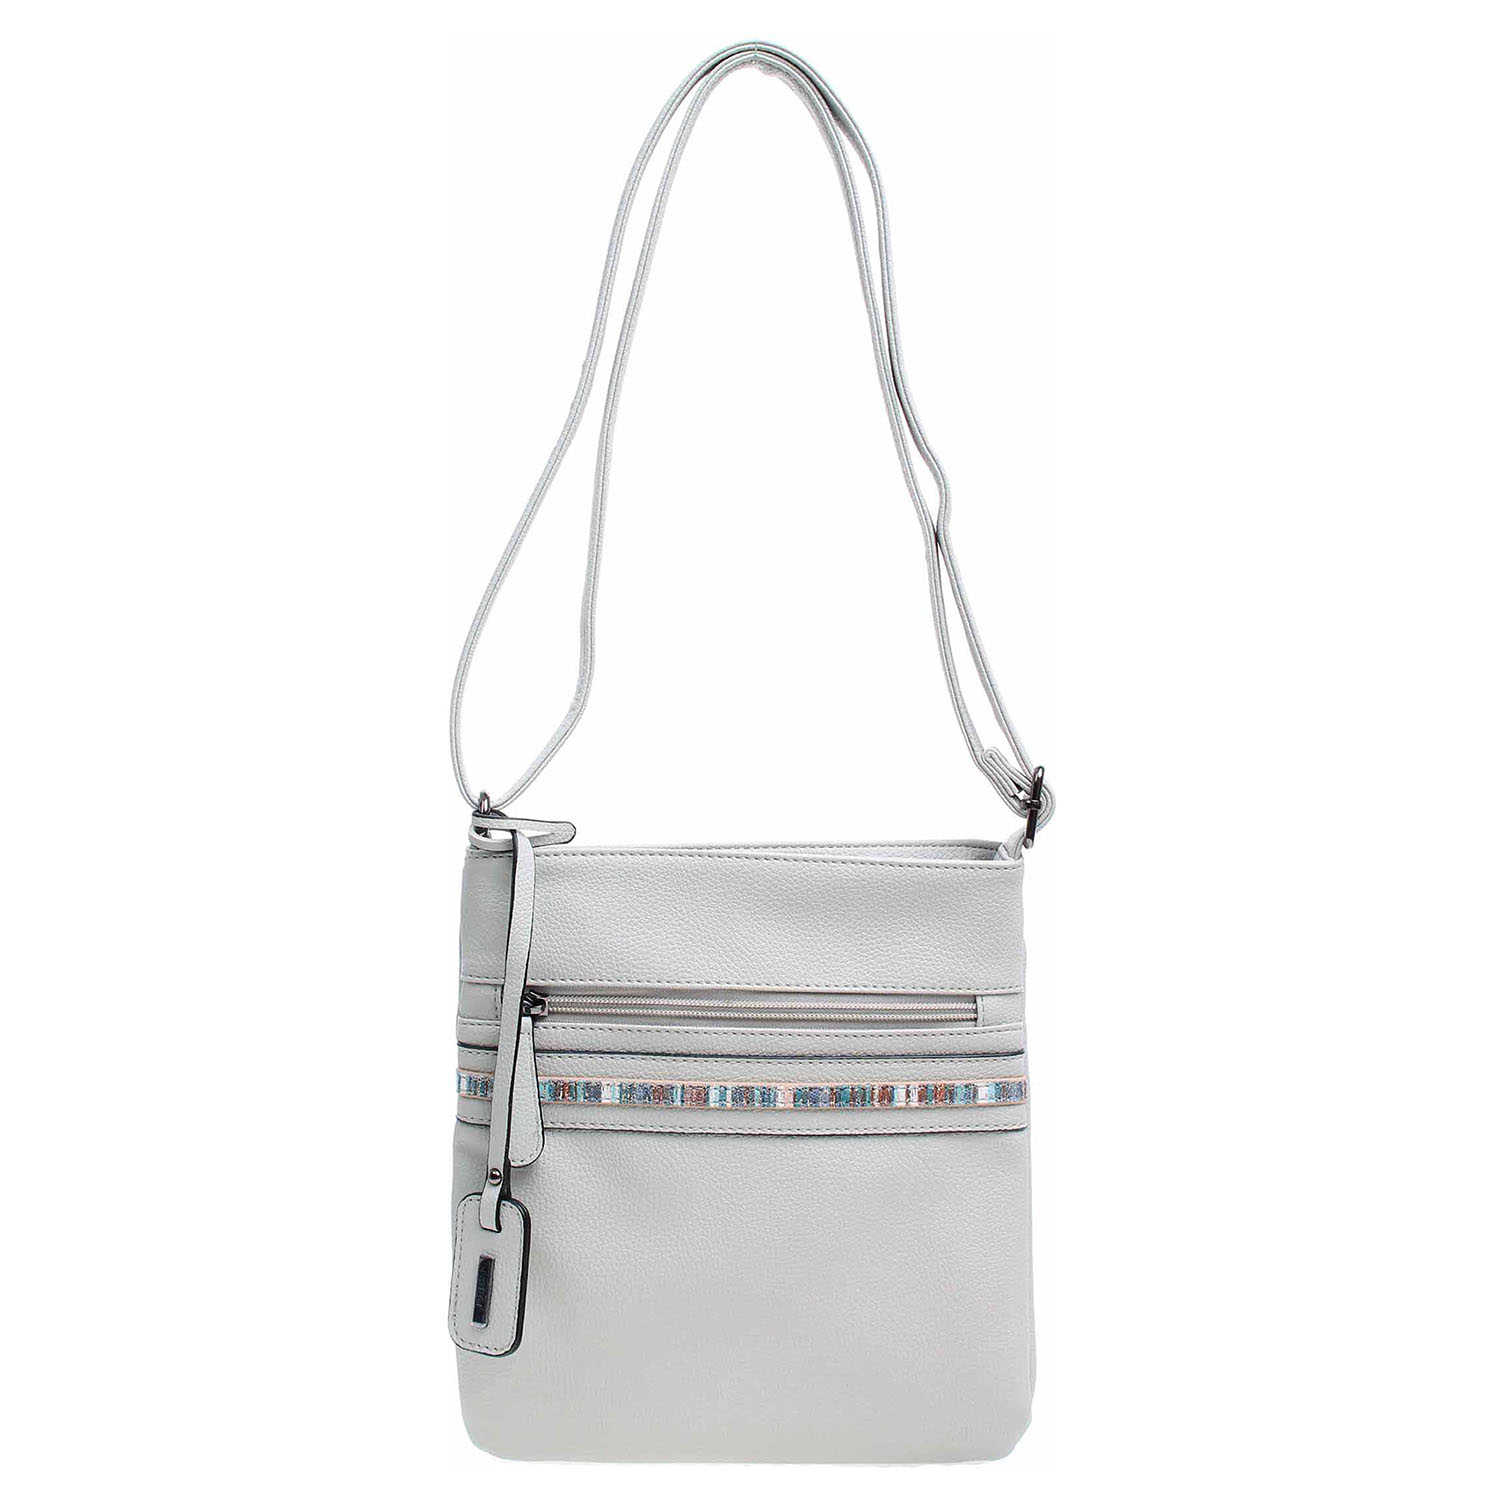 Ecco Rieker dámská kabelka H1001-62 clay 11891522